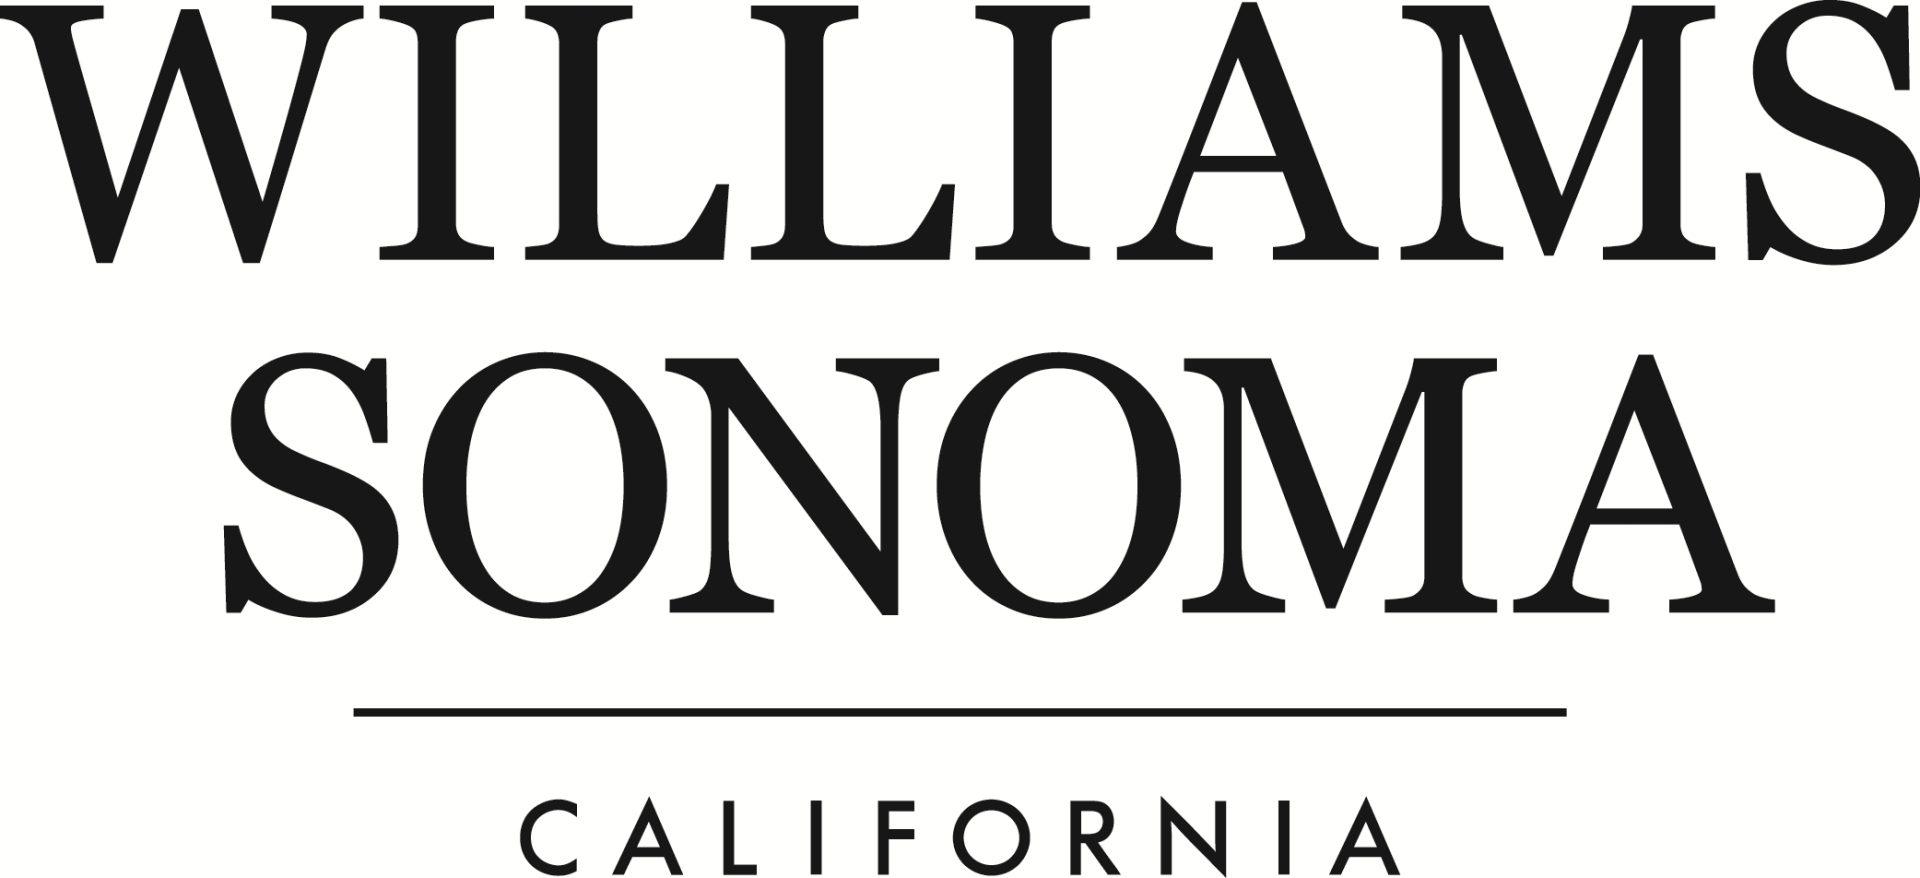 Williams Sonoma Corporate Office Headquarters